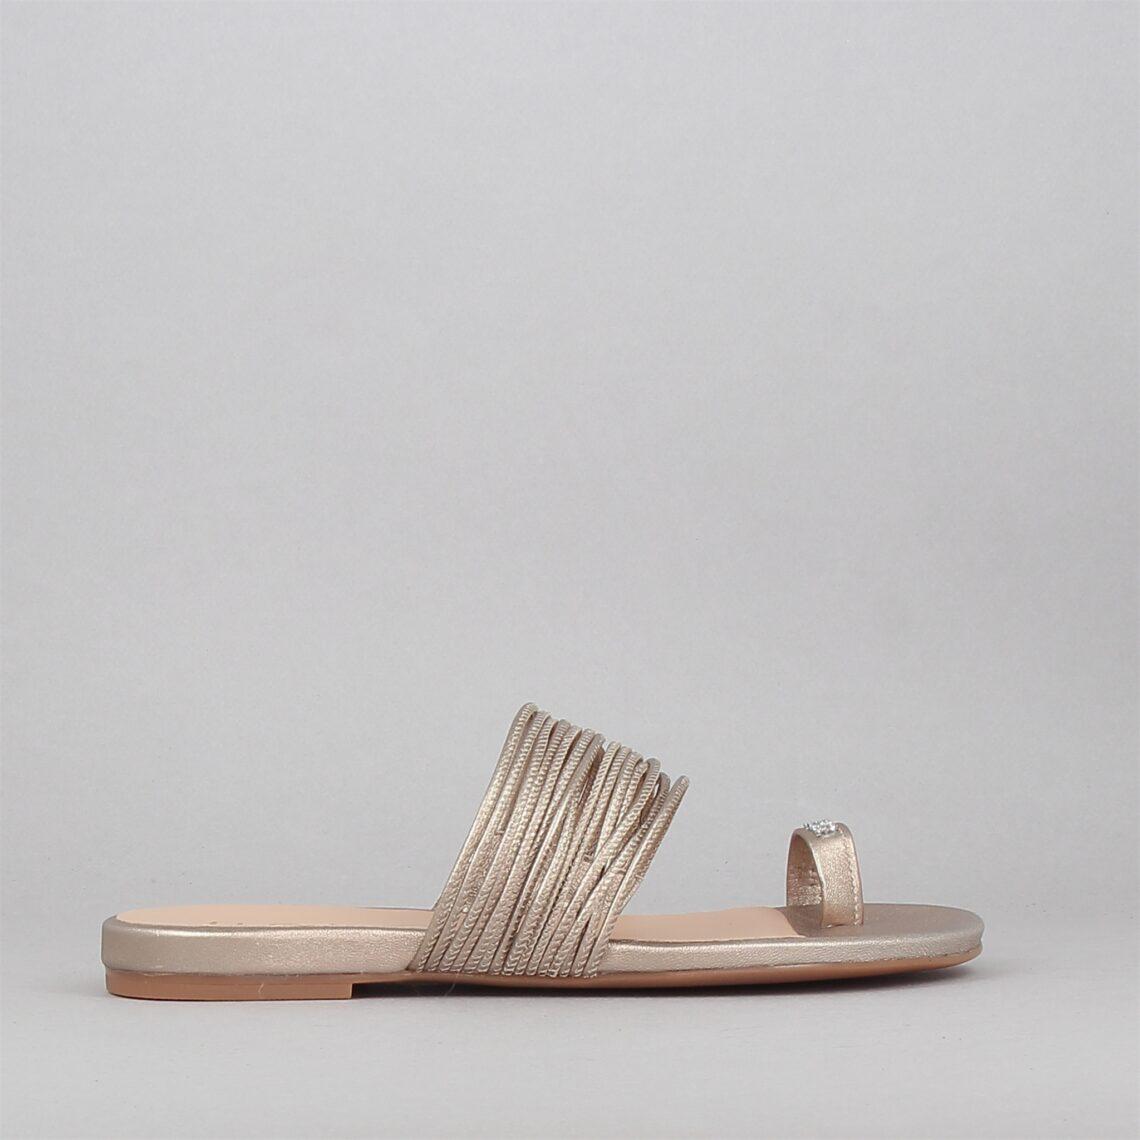 cecile-19-bronze-175996930-0.jpg